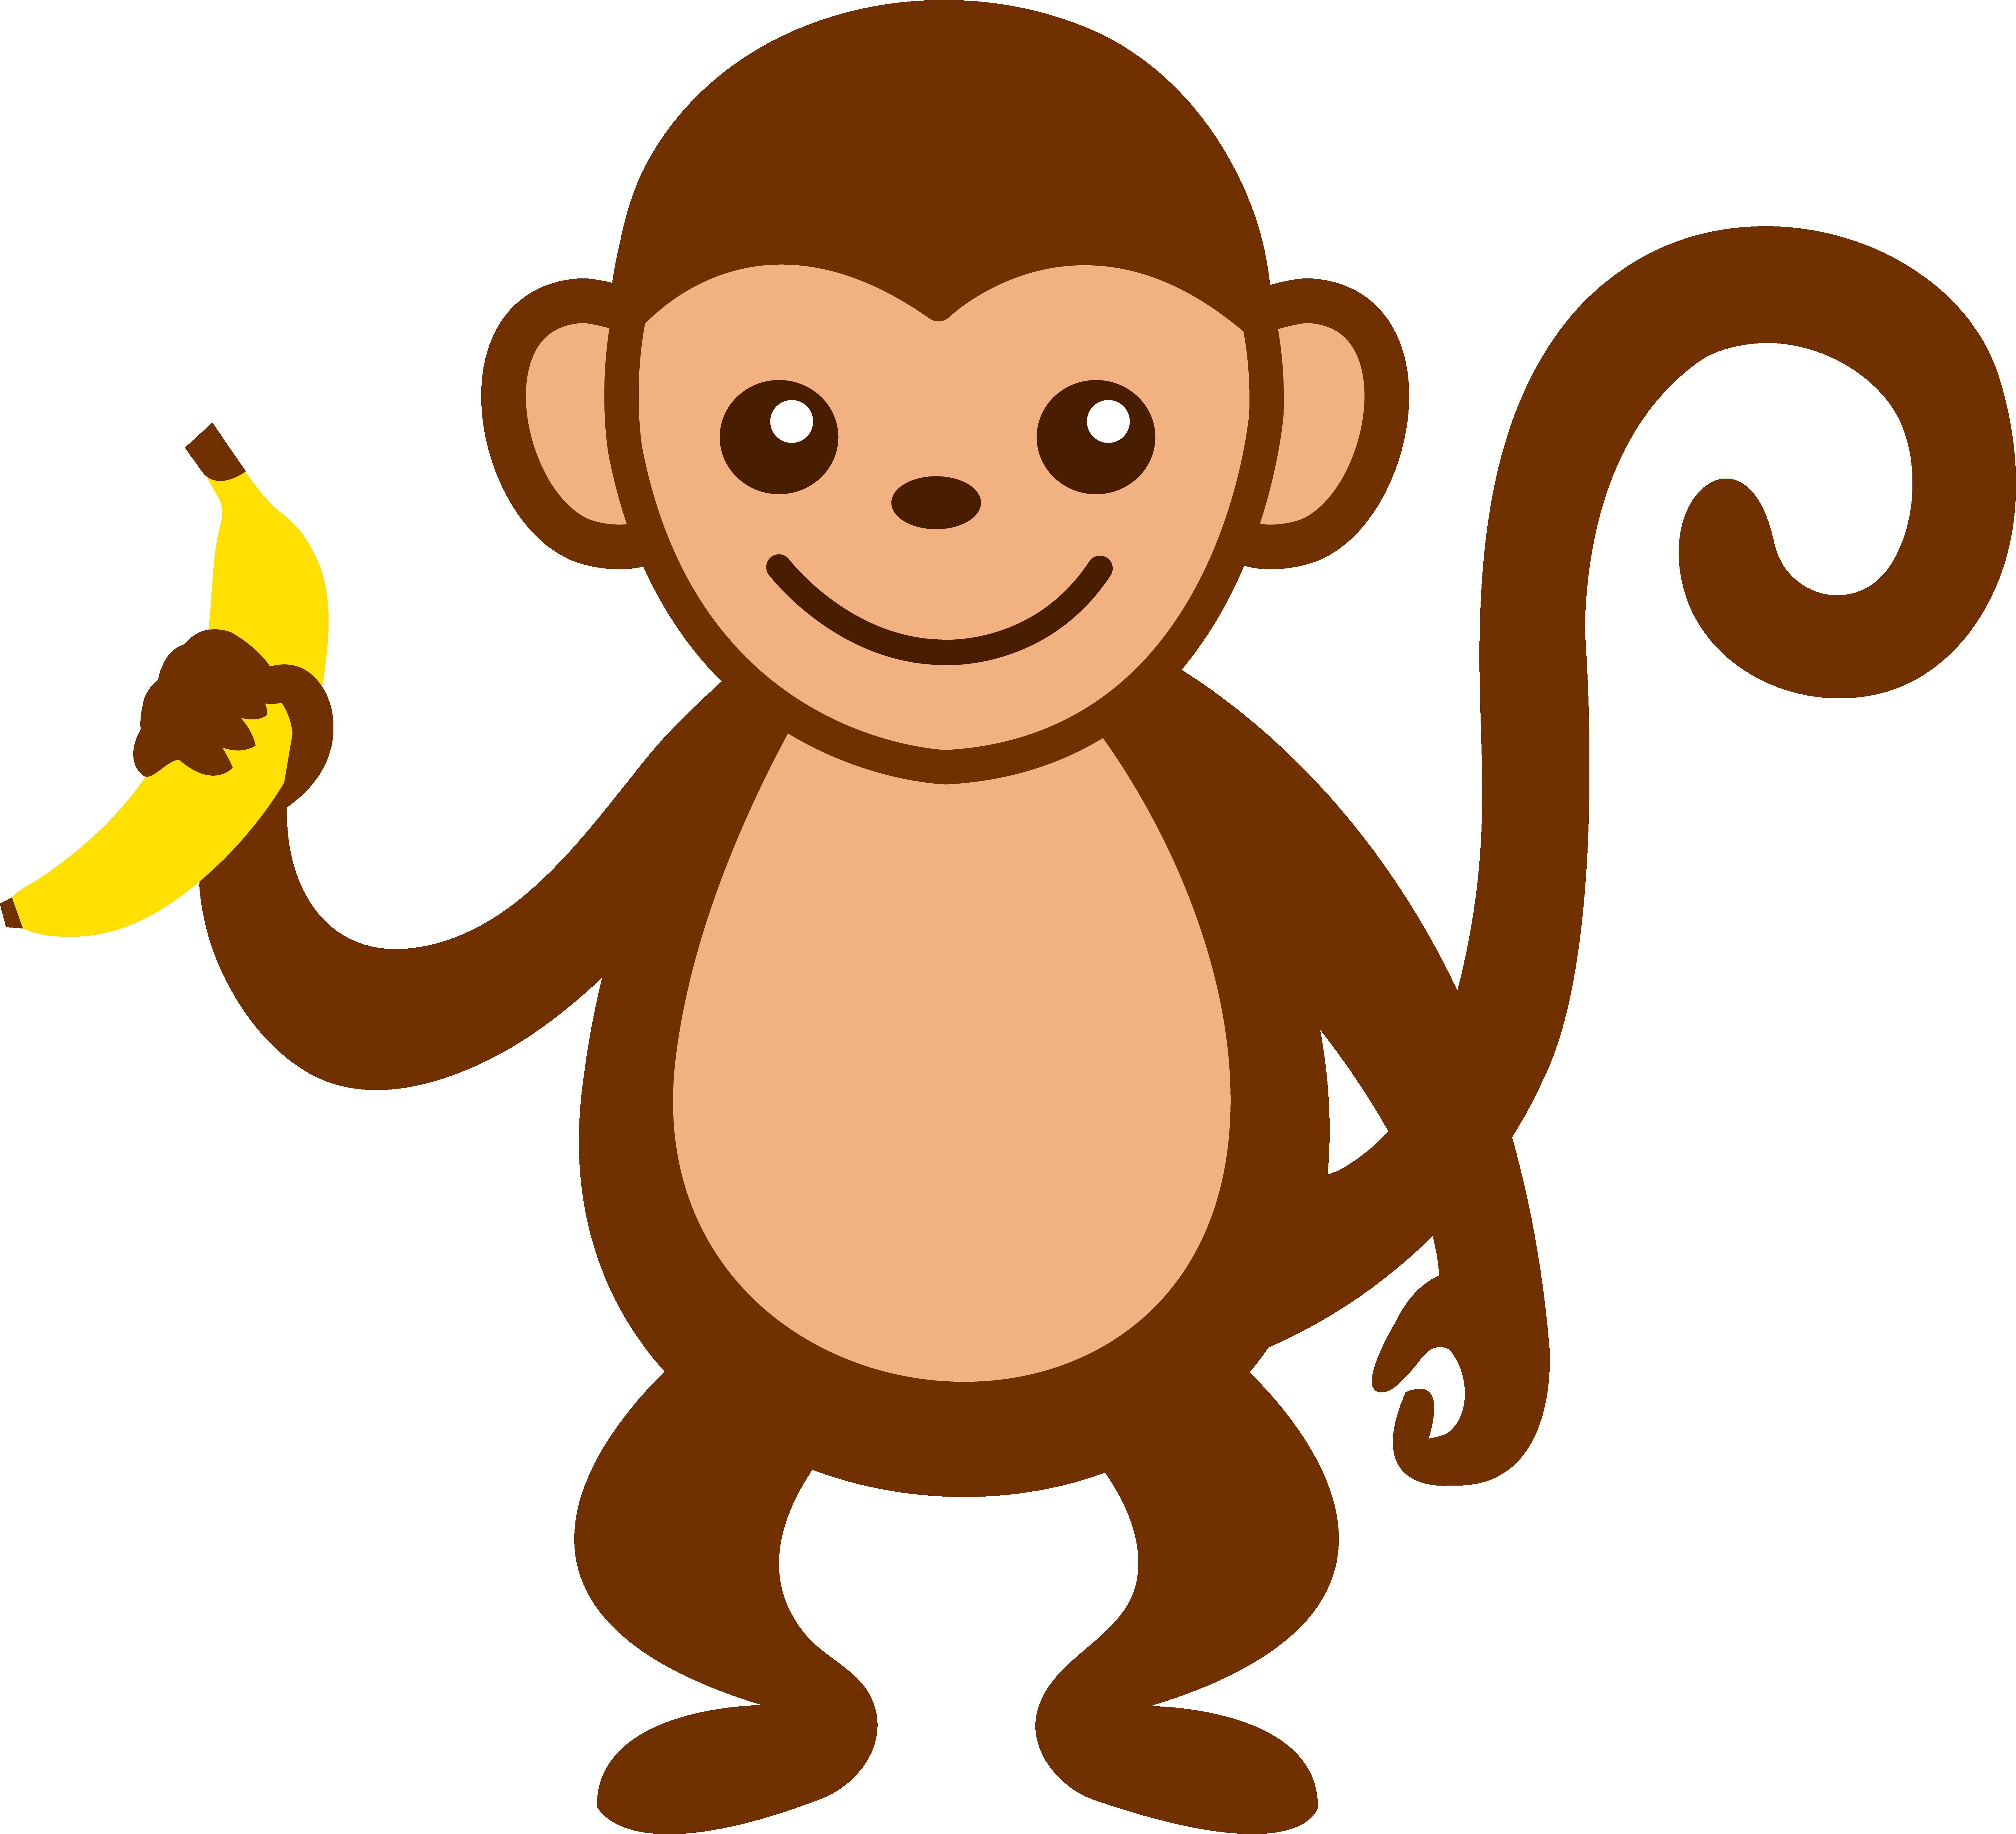 6597x6001 Cartoon Monkey Clip Art Cute With Banana Free Amazing Images